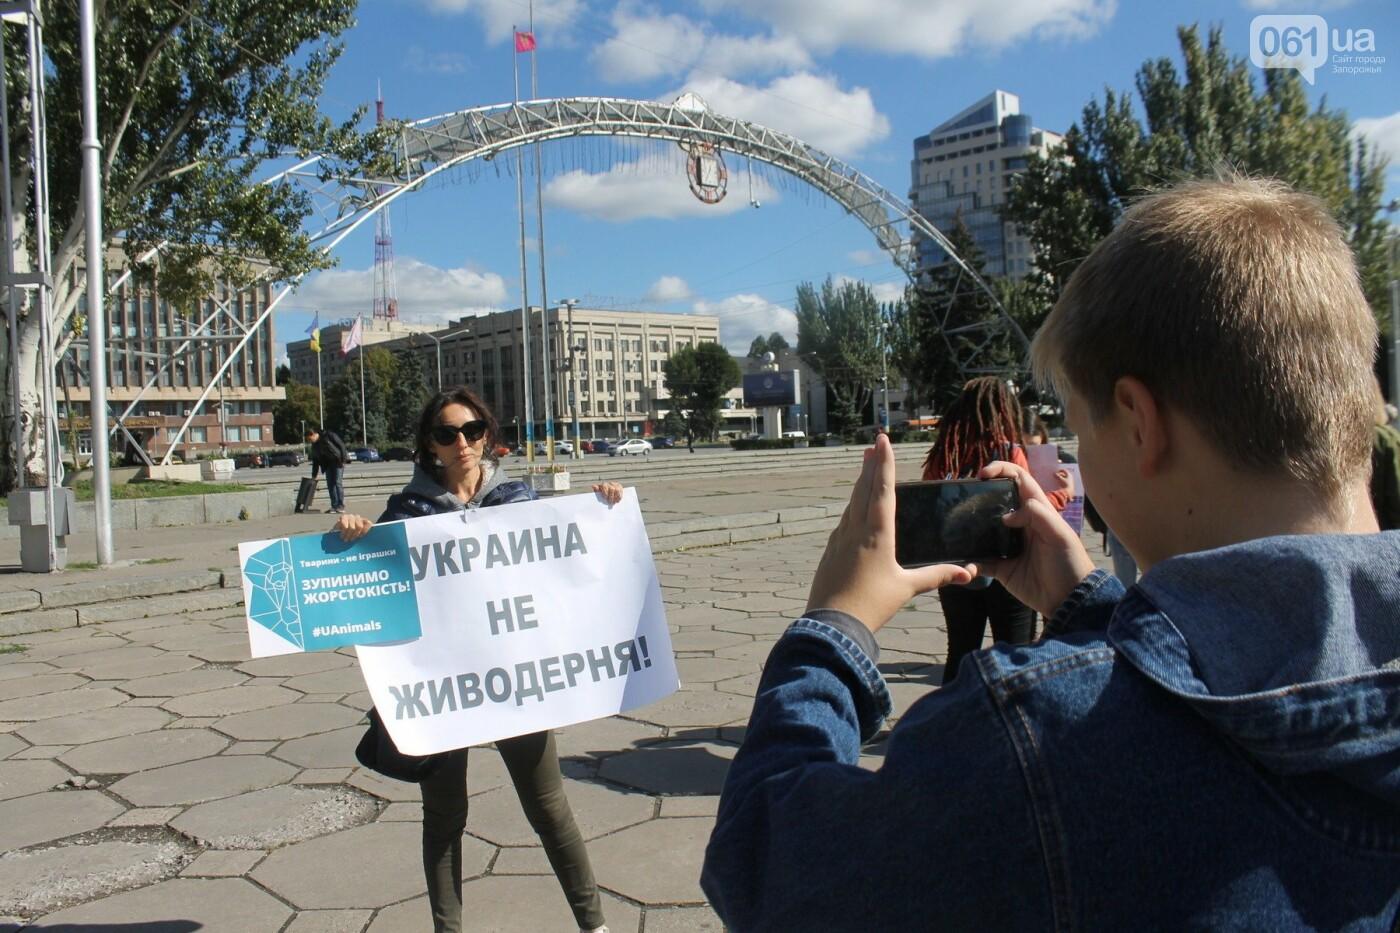 «Защити! Не мучай»: в Запорожье провели марш за права животных, – ФОТОРЕПОРТАЖ, ВИДЕО, фото-18